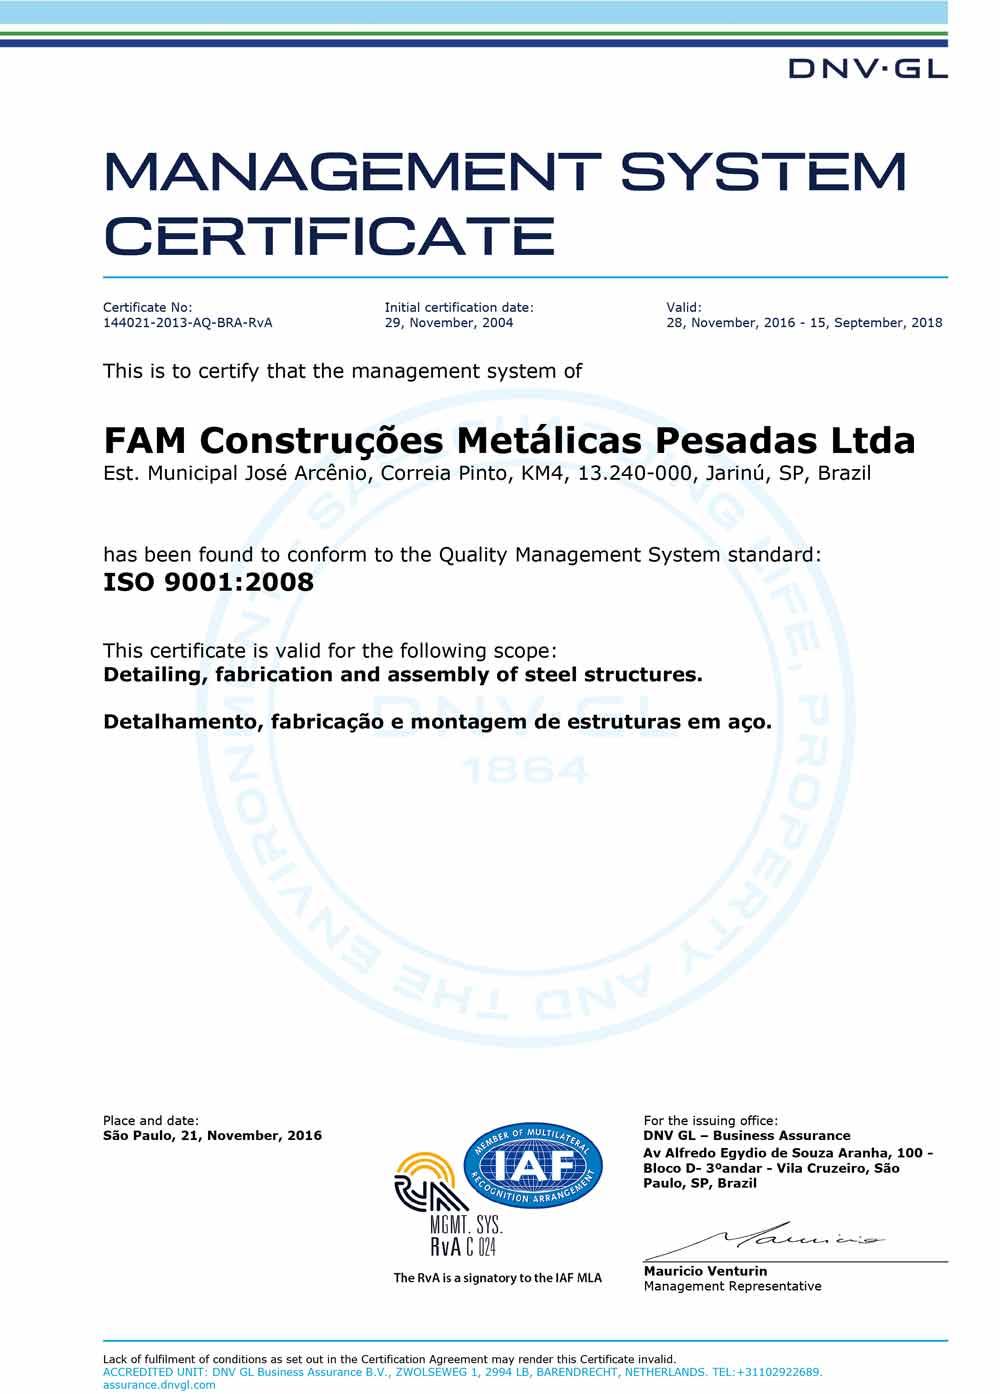 certificacao-iso-9001-fam-estrutura-metalica-2016